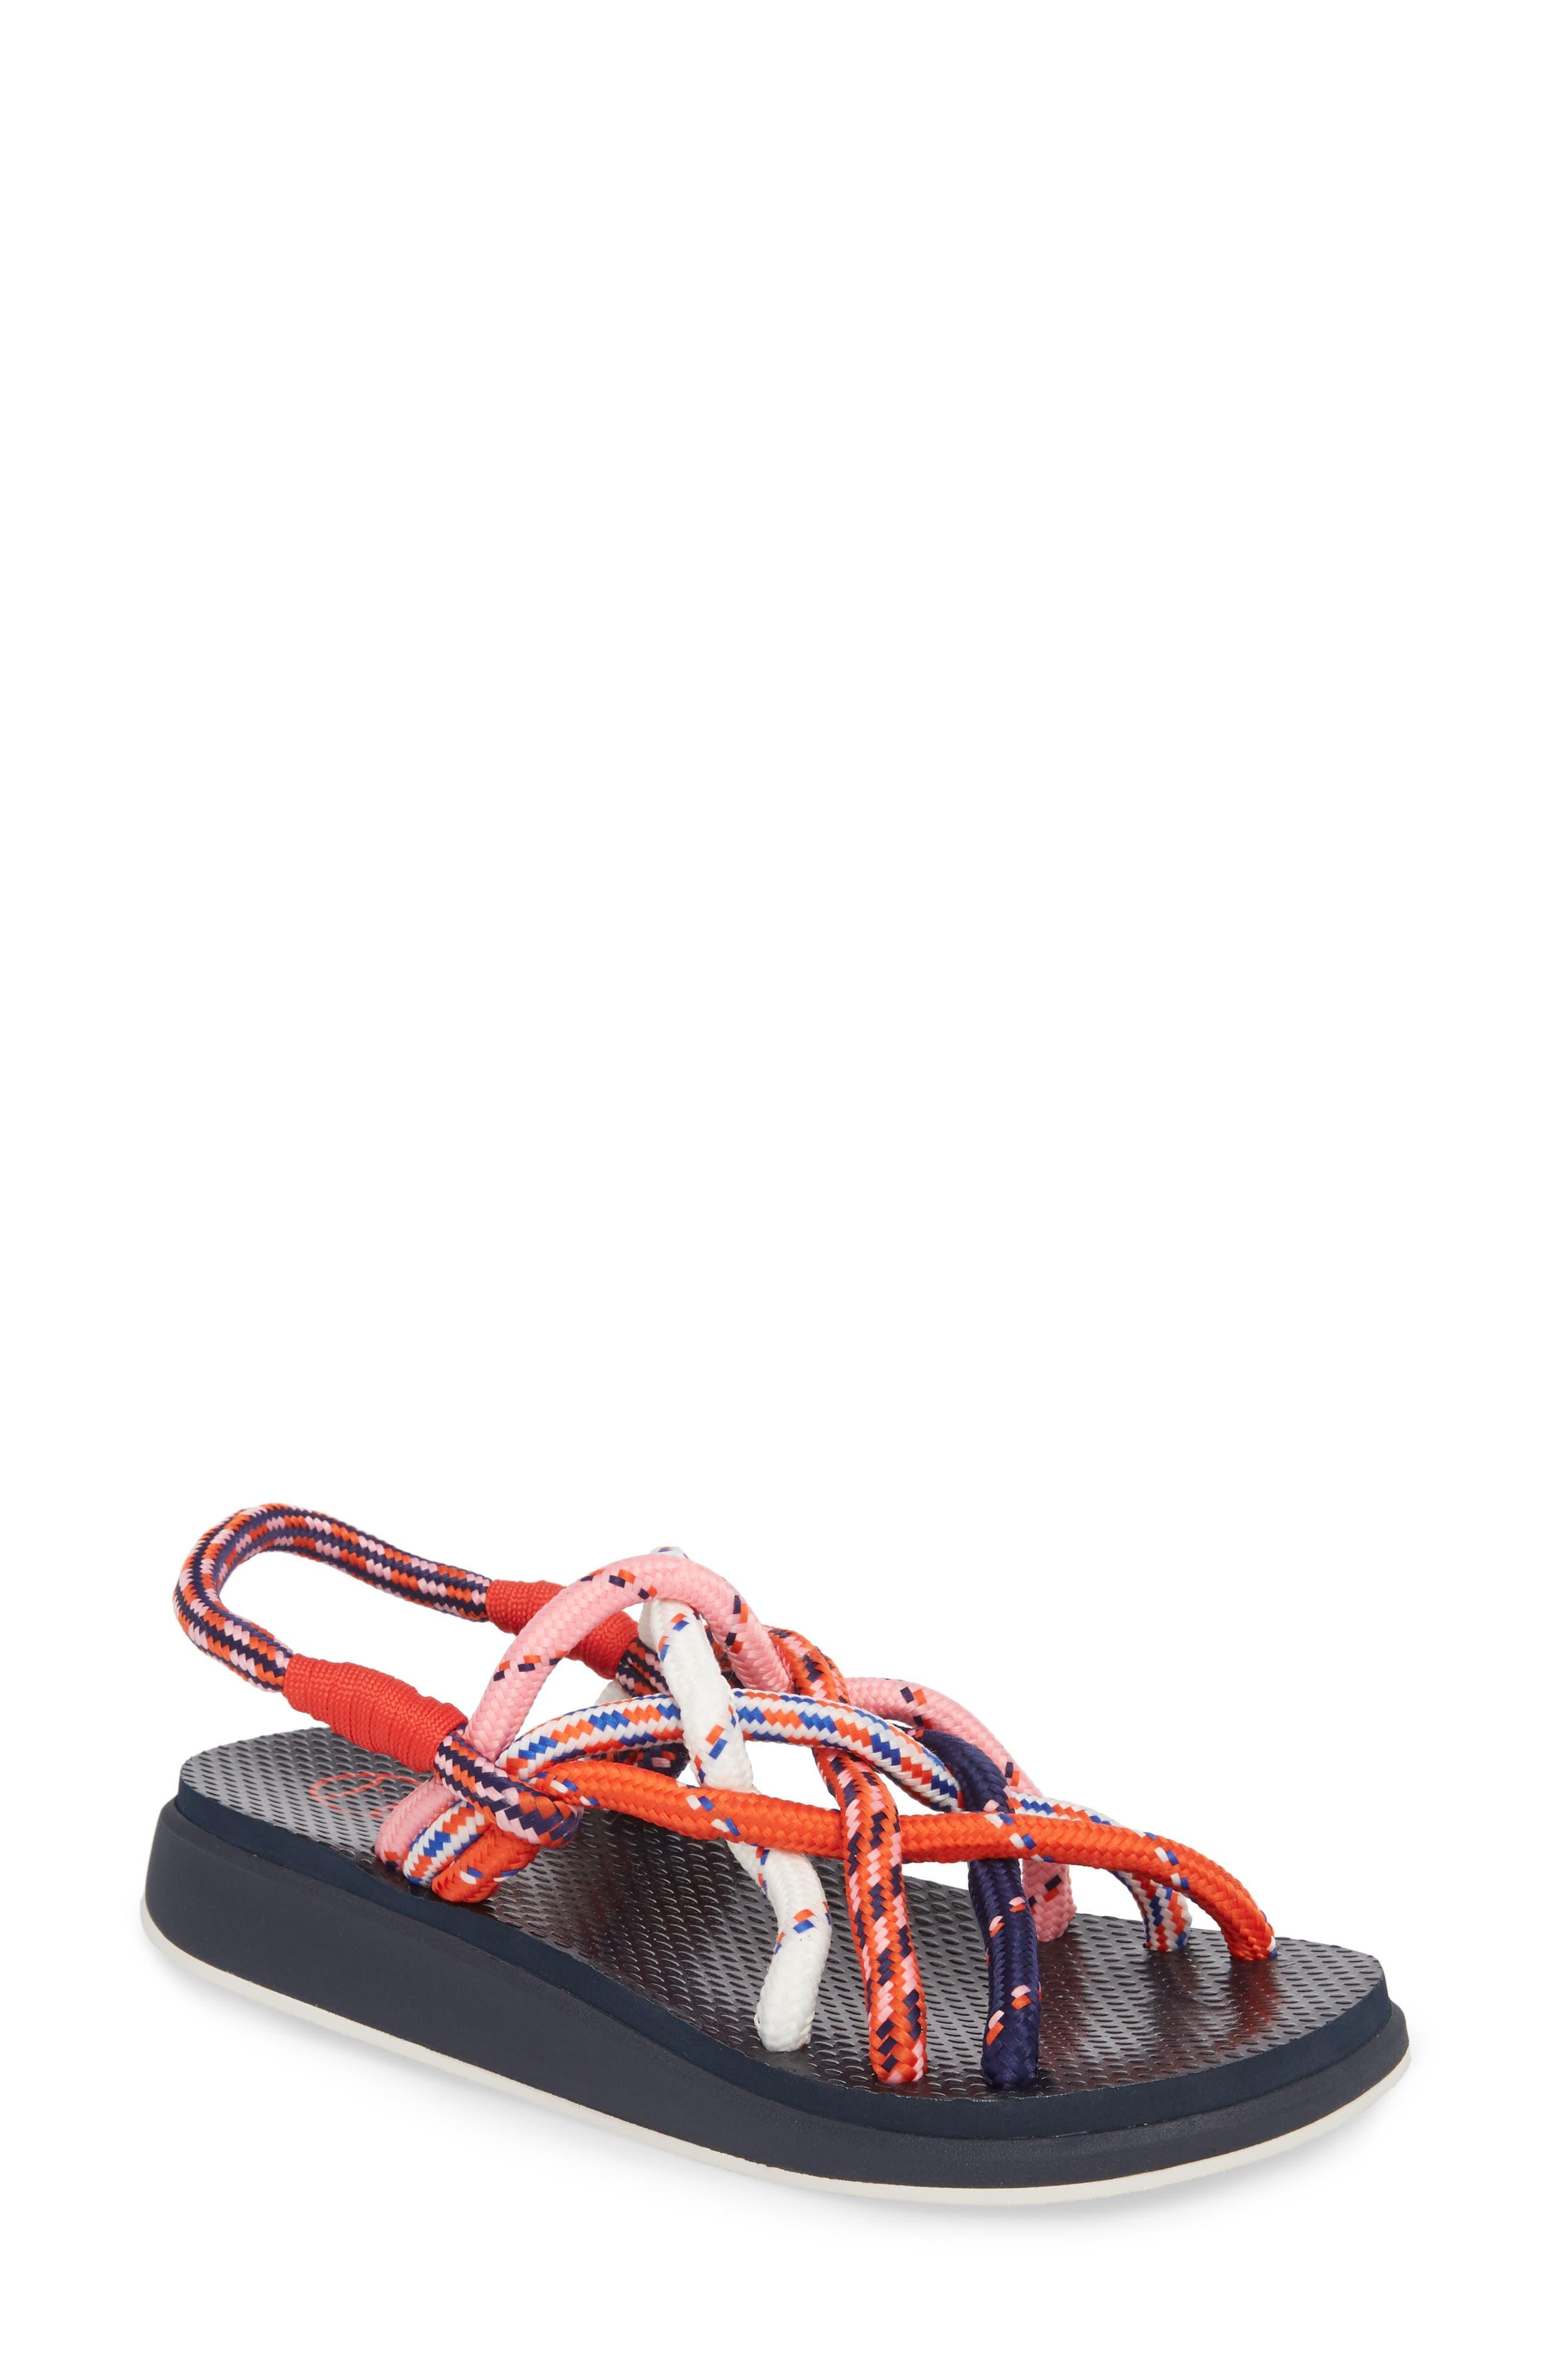 Rope Sandal,                             Main thumbnail 1, color,                             Red Multi